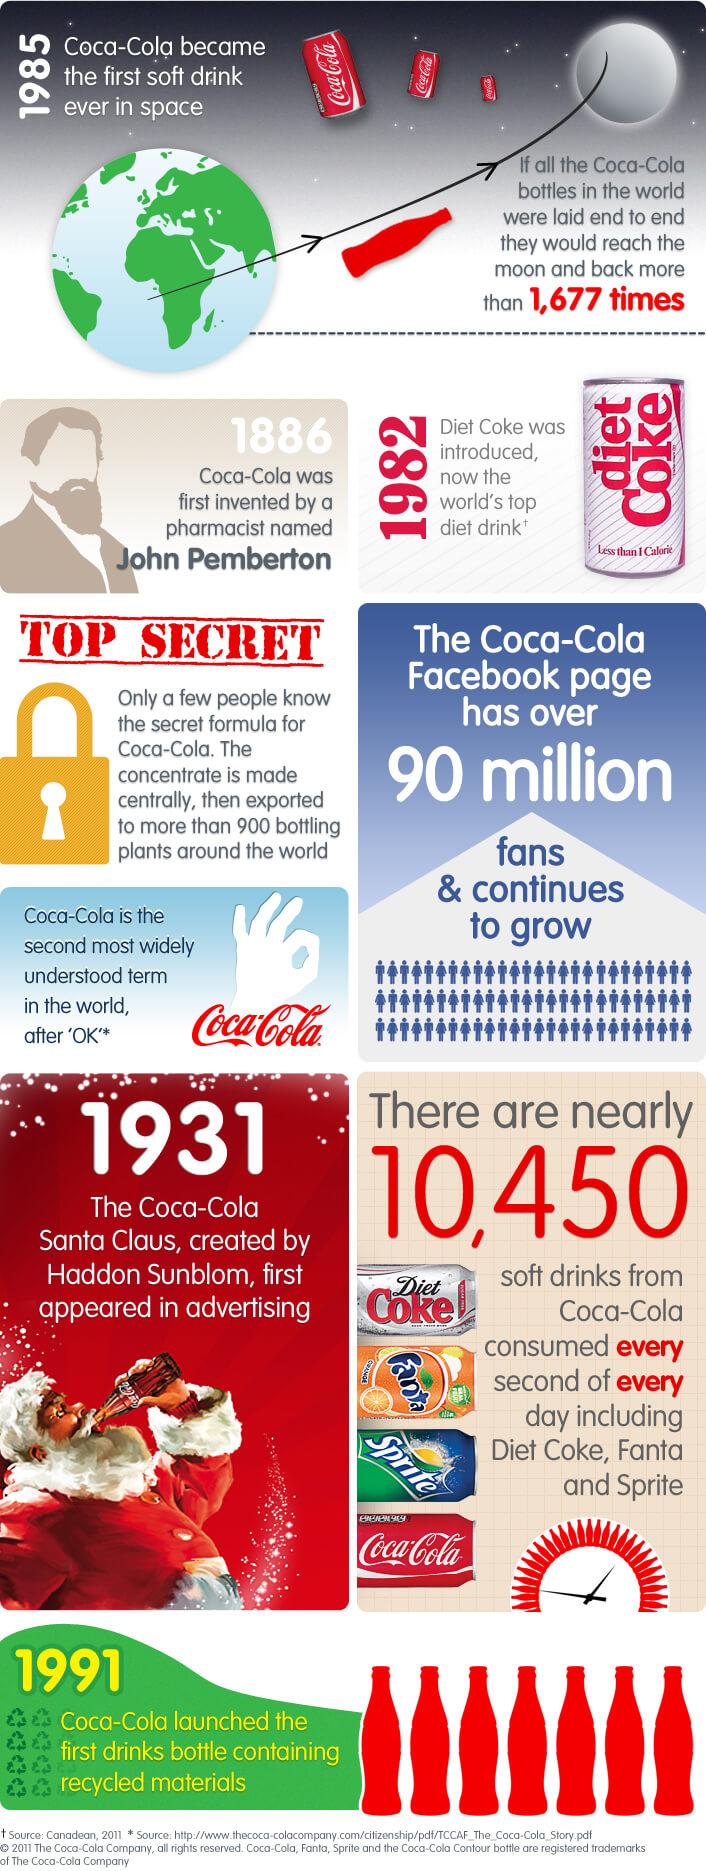 Coca Cola 125 Years Anniversary